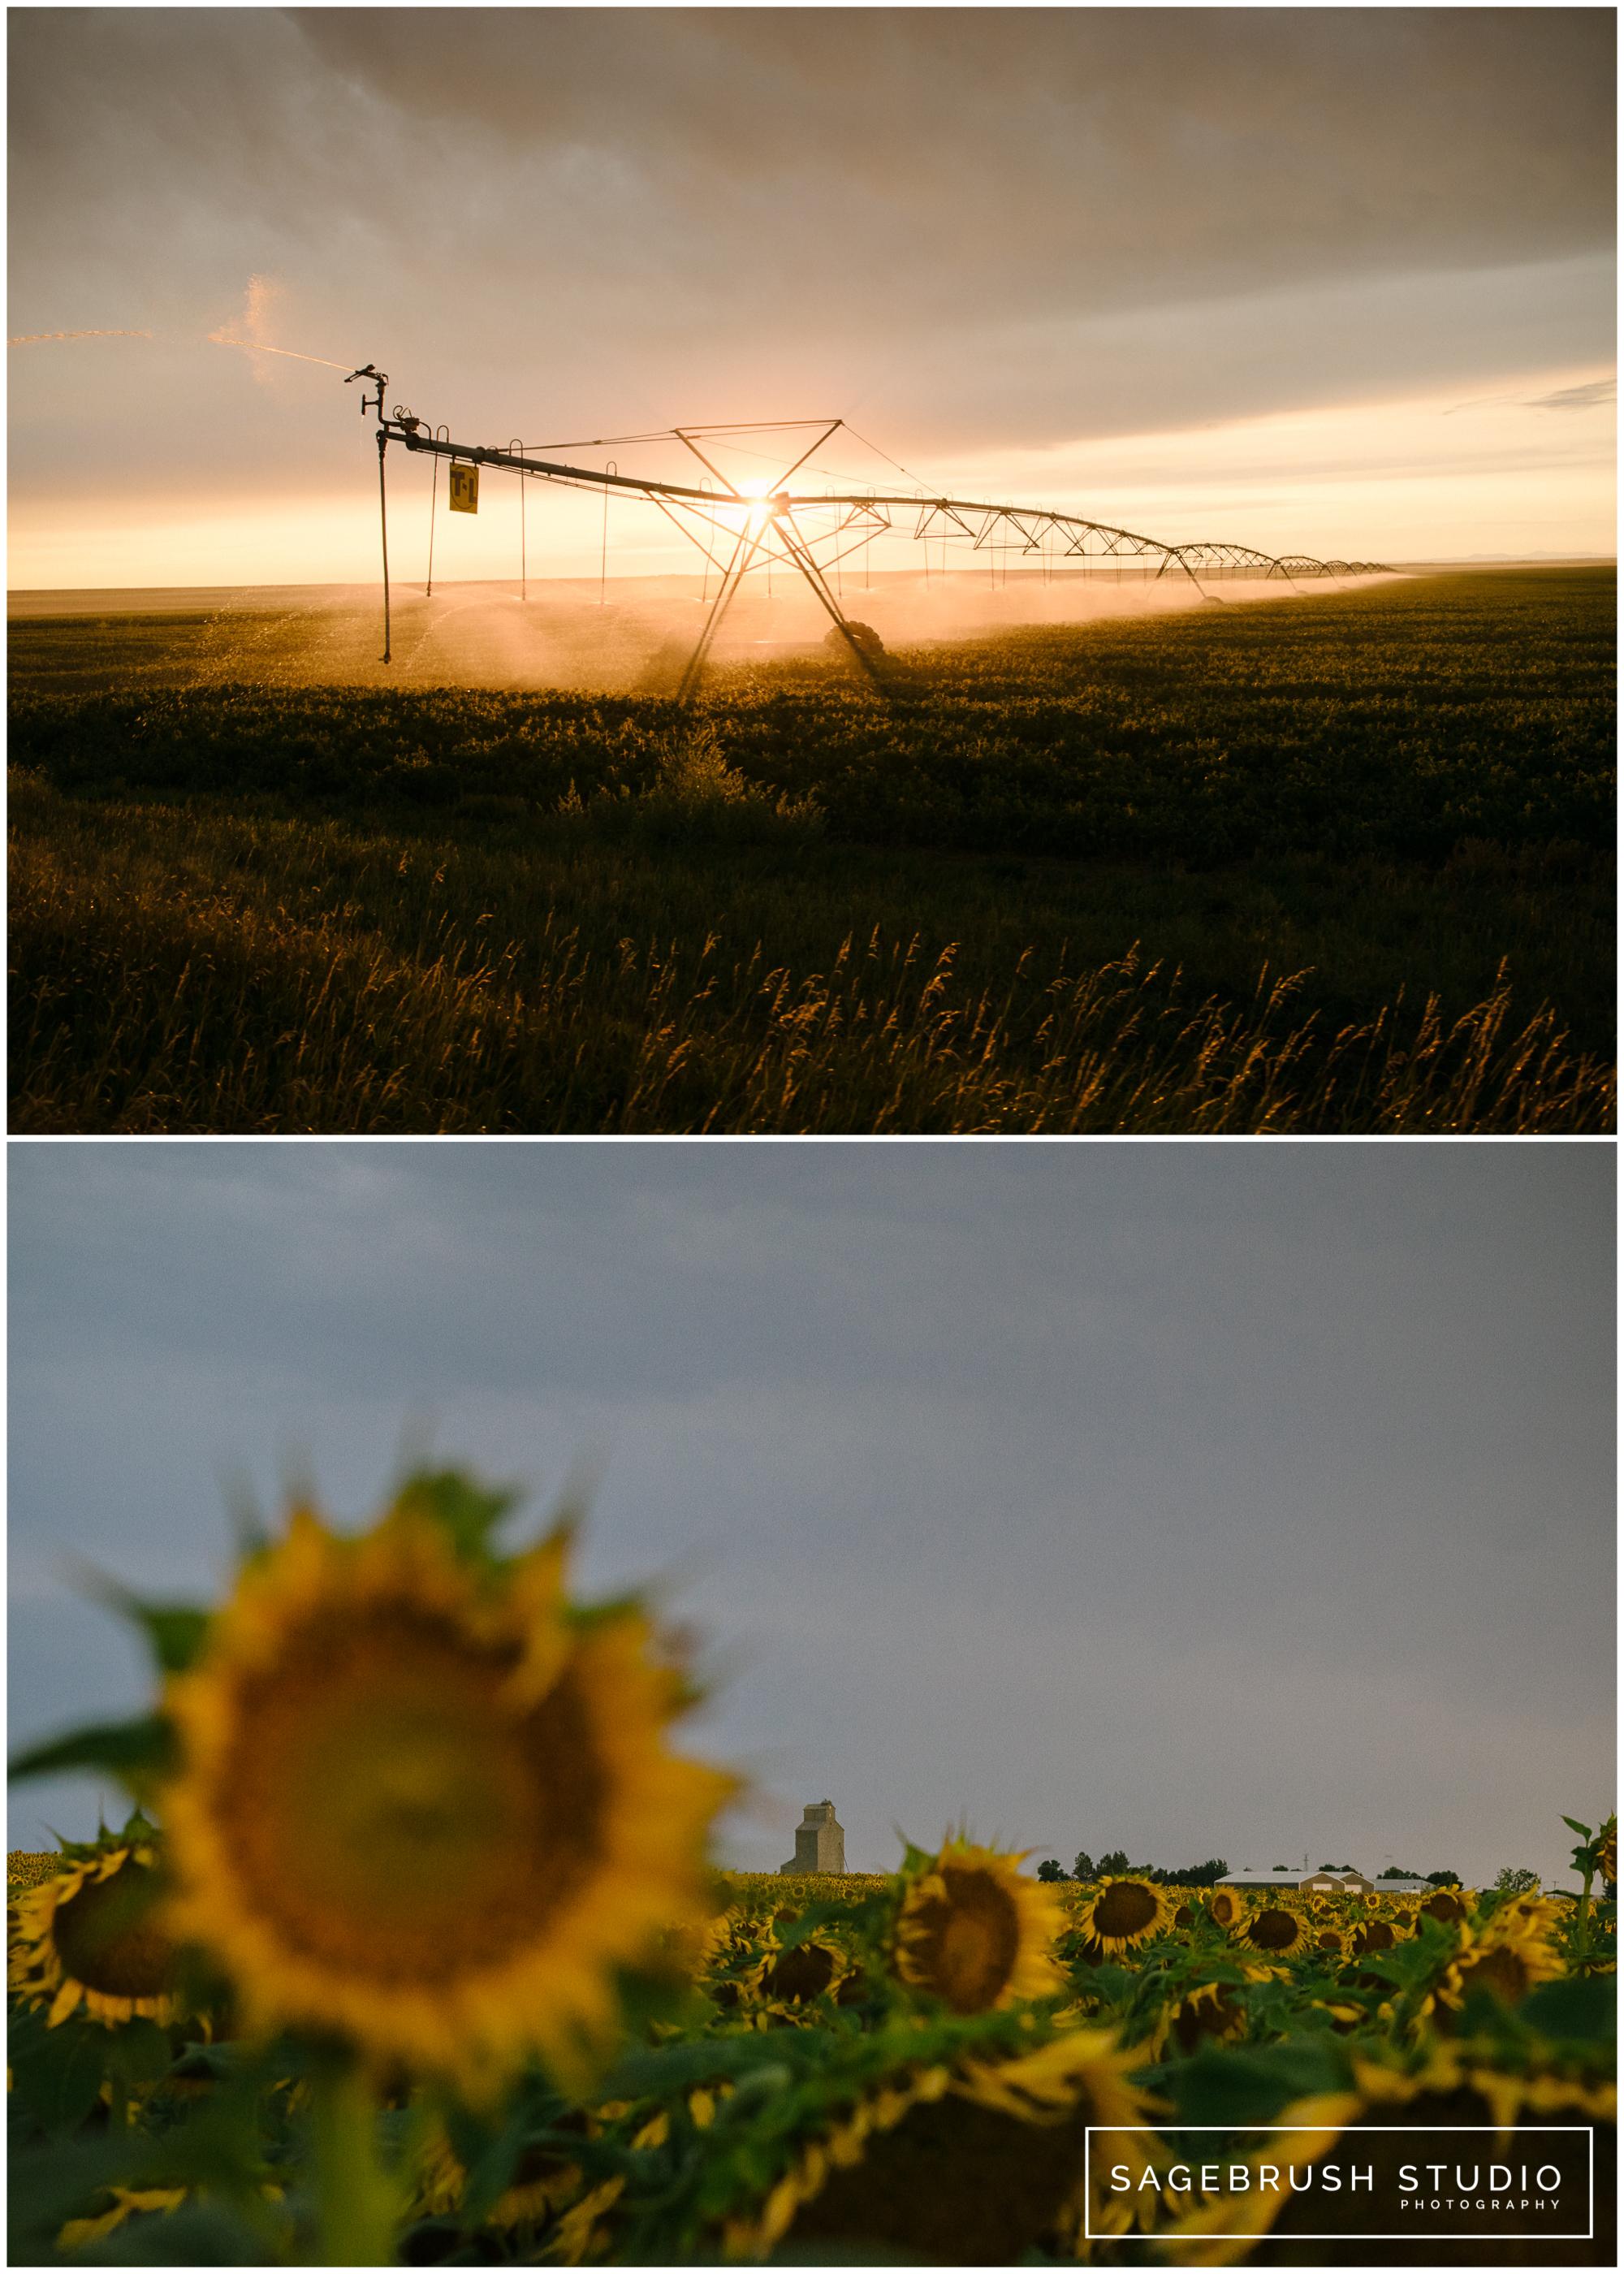 Sagebrush Studio. Sunflowers and Sunrise.